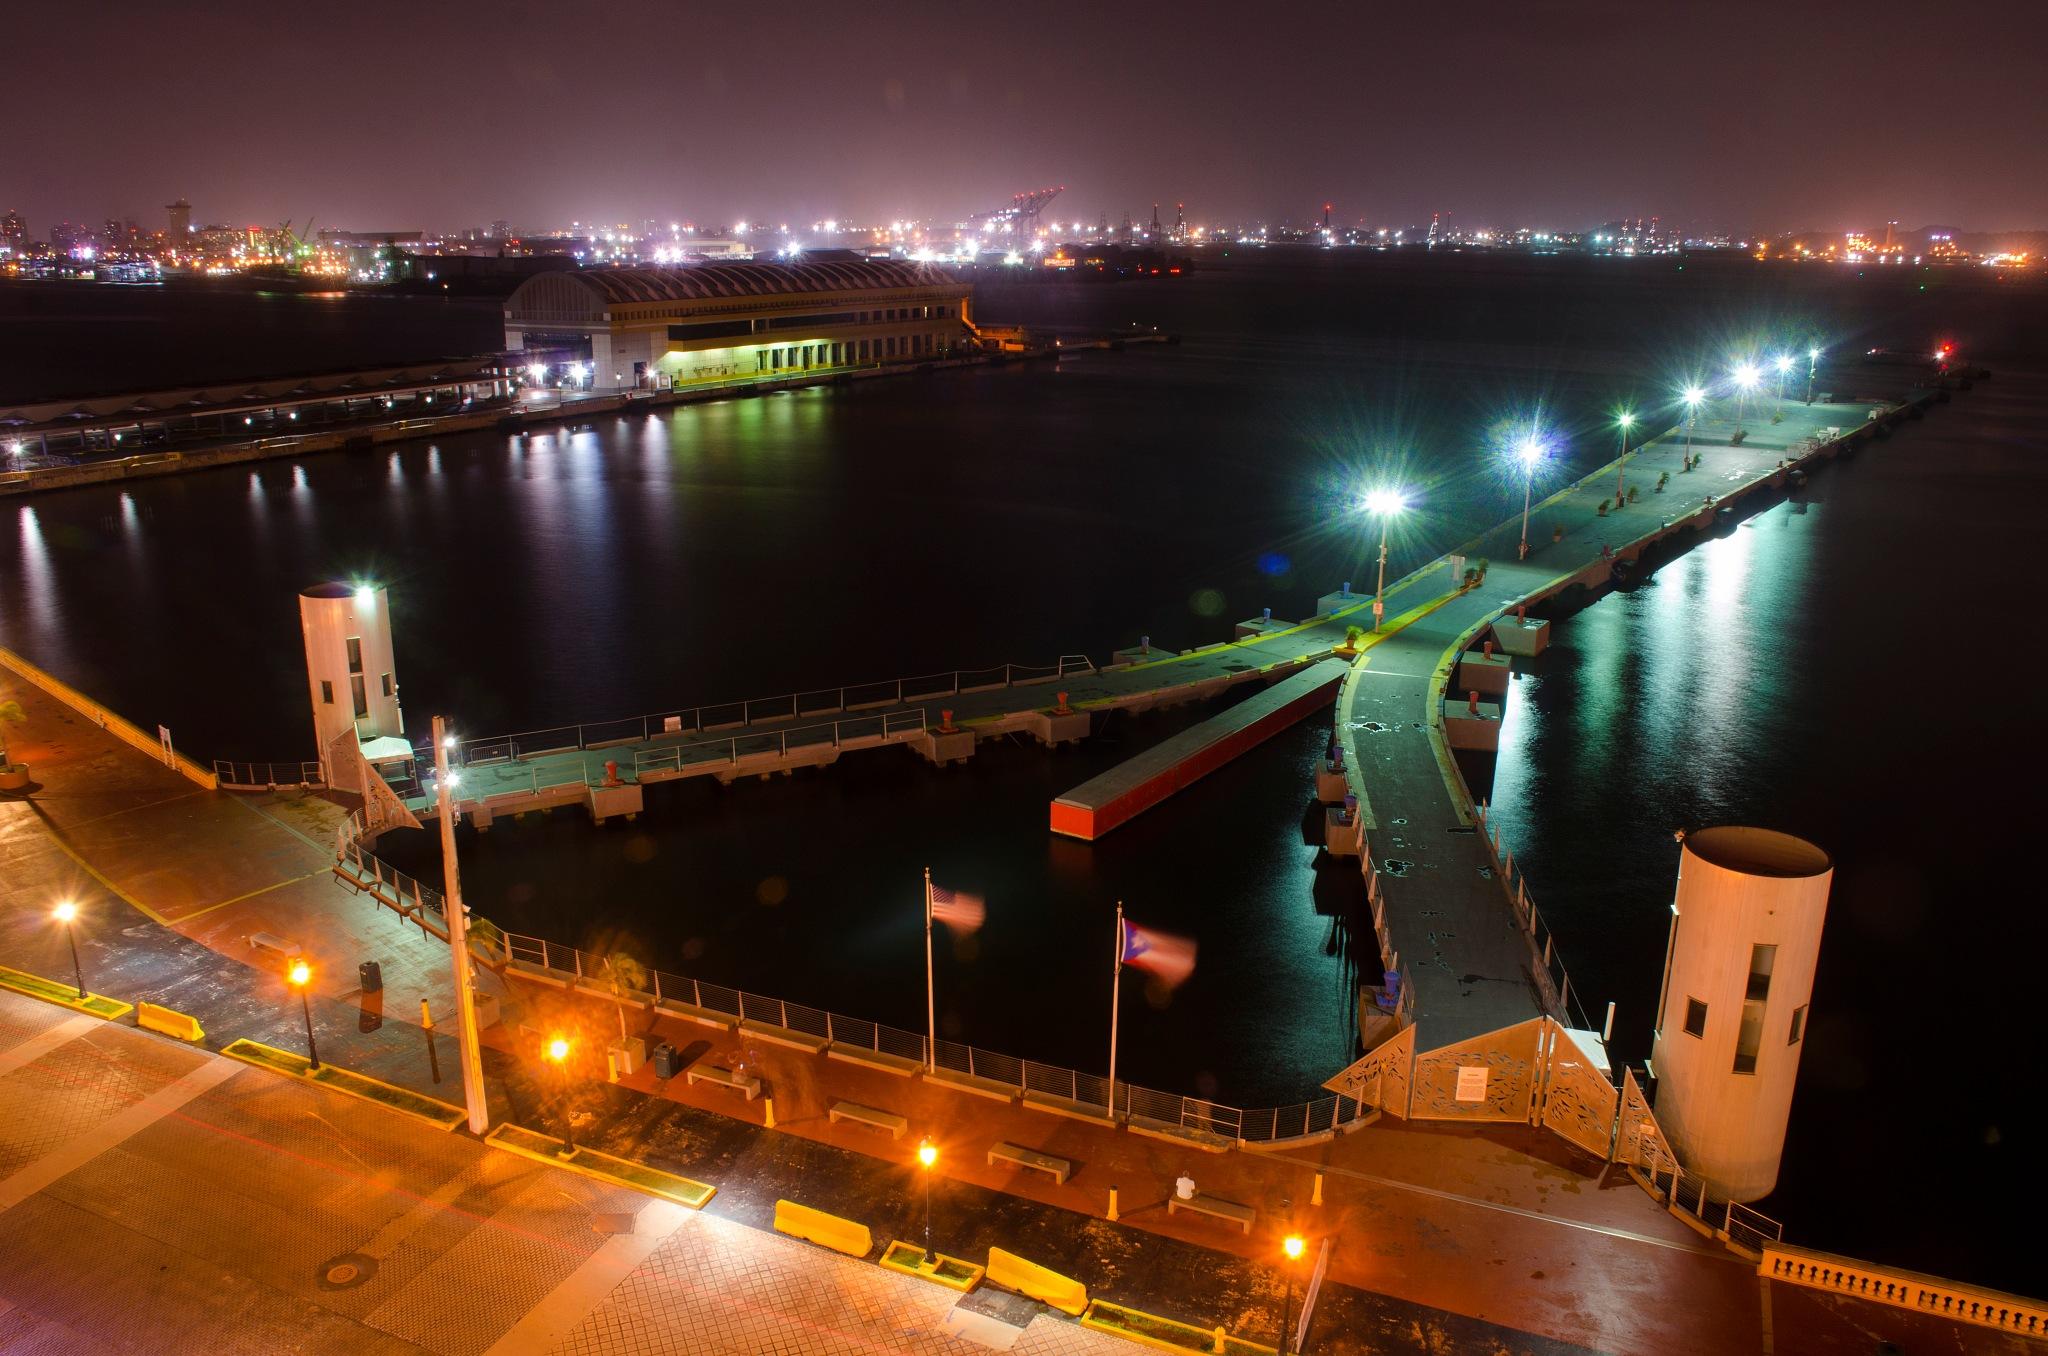 Gangway by night by marokkyprianou